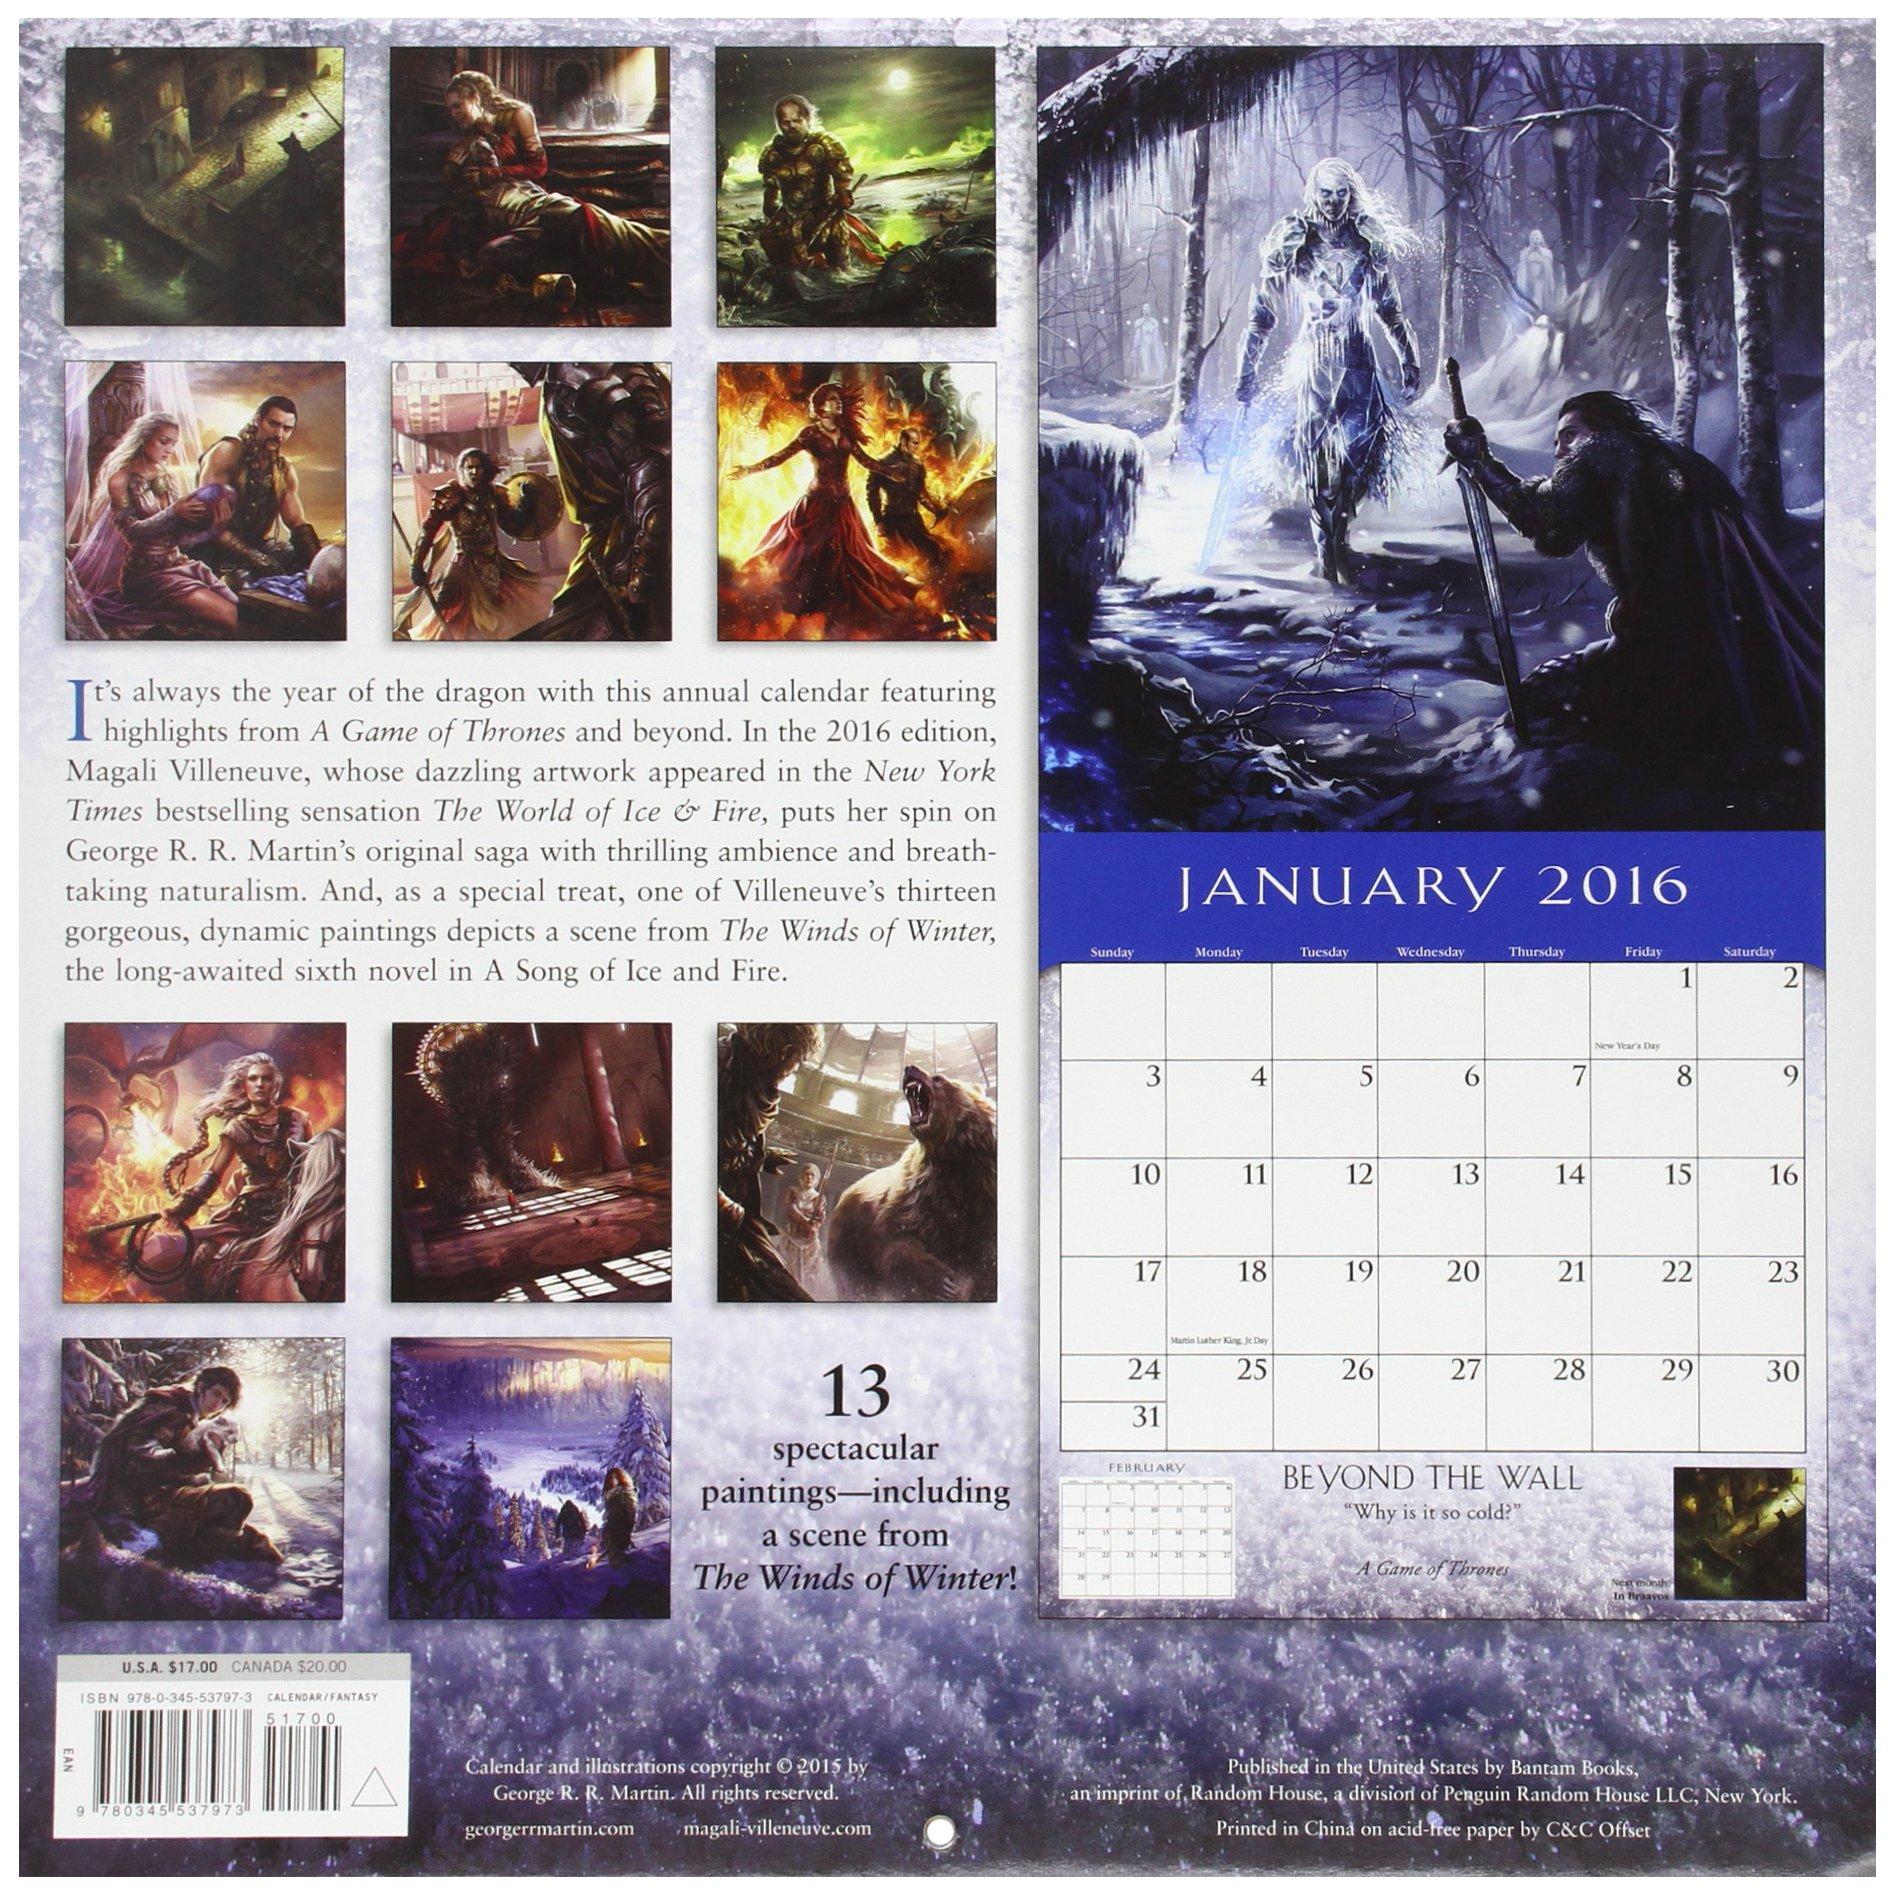 2016 Calendar (Calendar